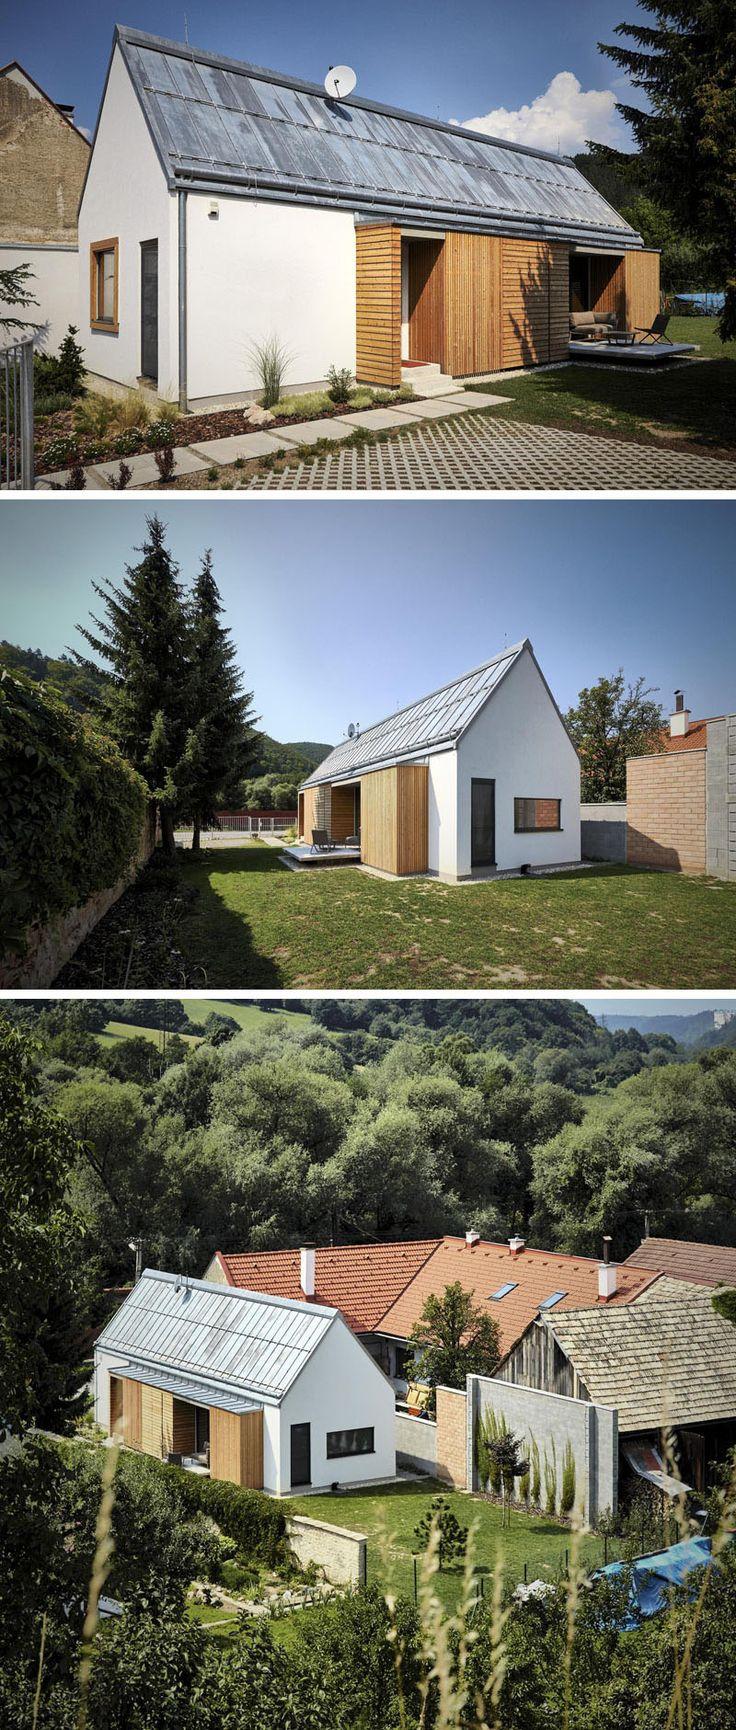 best 25+ small modern houses ideas on pinterest | small modern